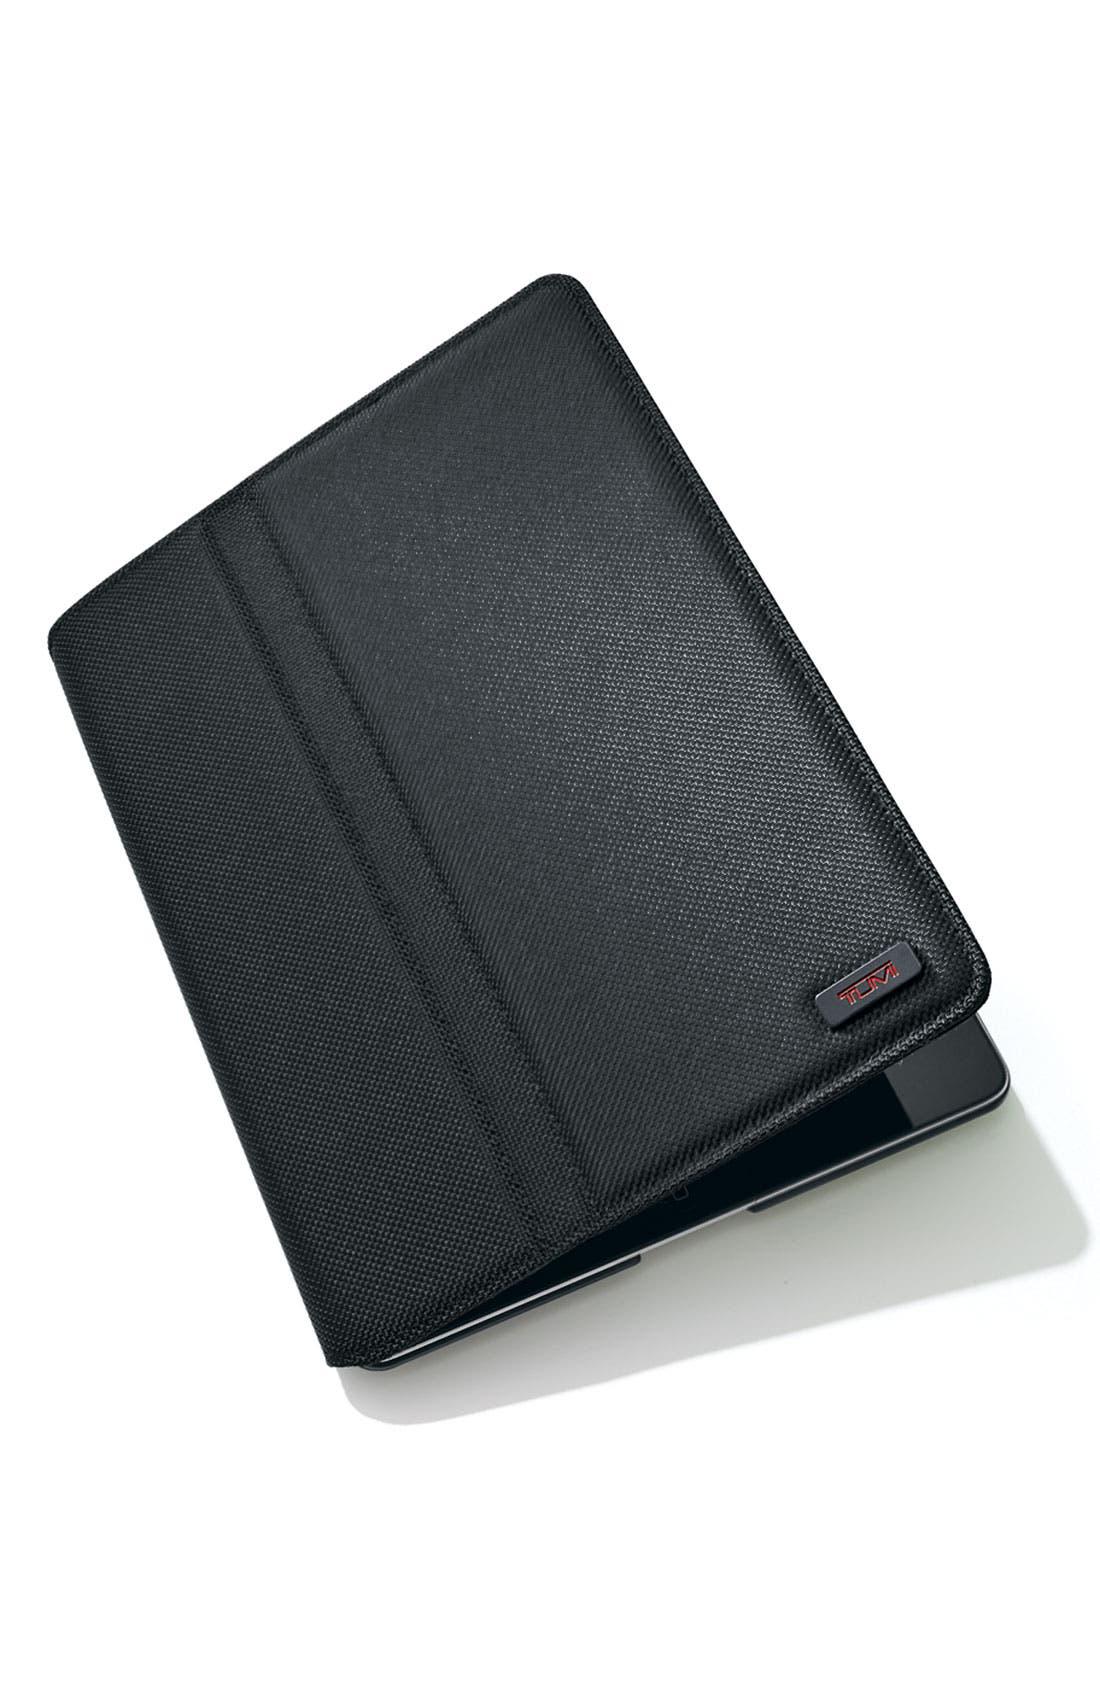 Ballistic Nylon iPad 2 Cover,                             Alternate thumbnail 5, color,                             007